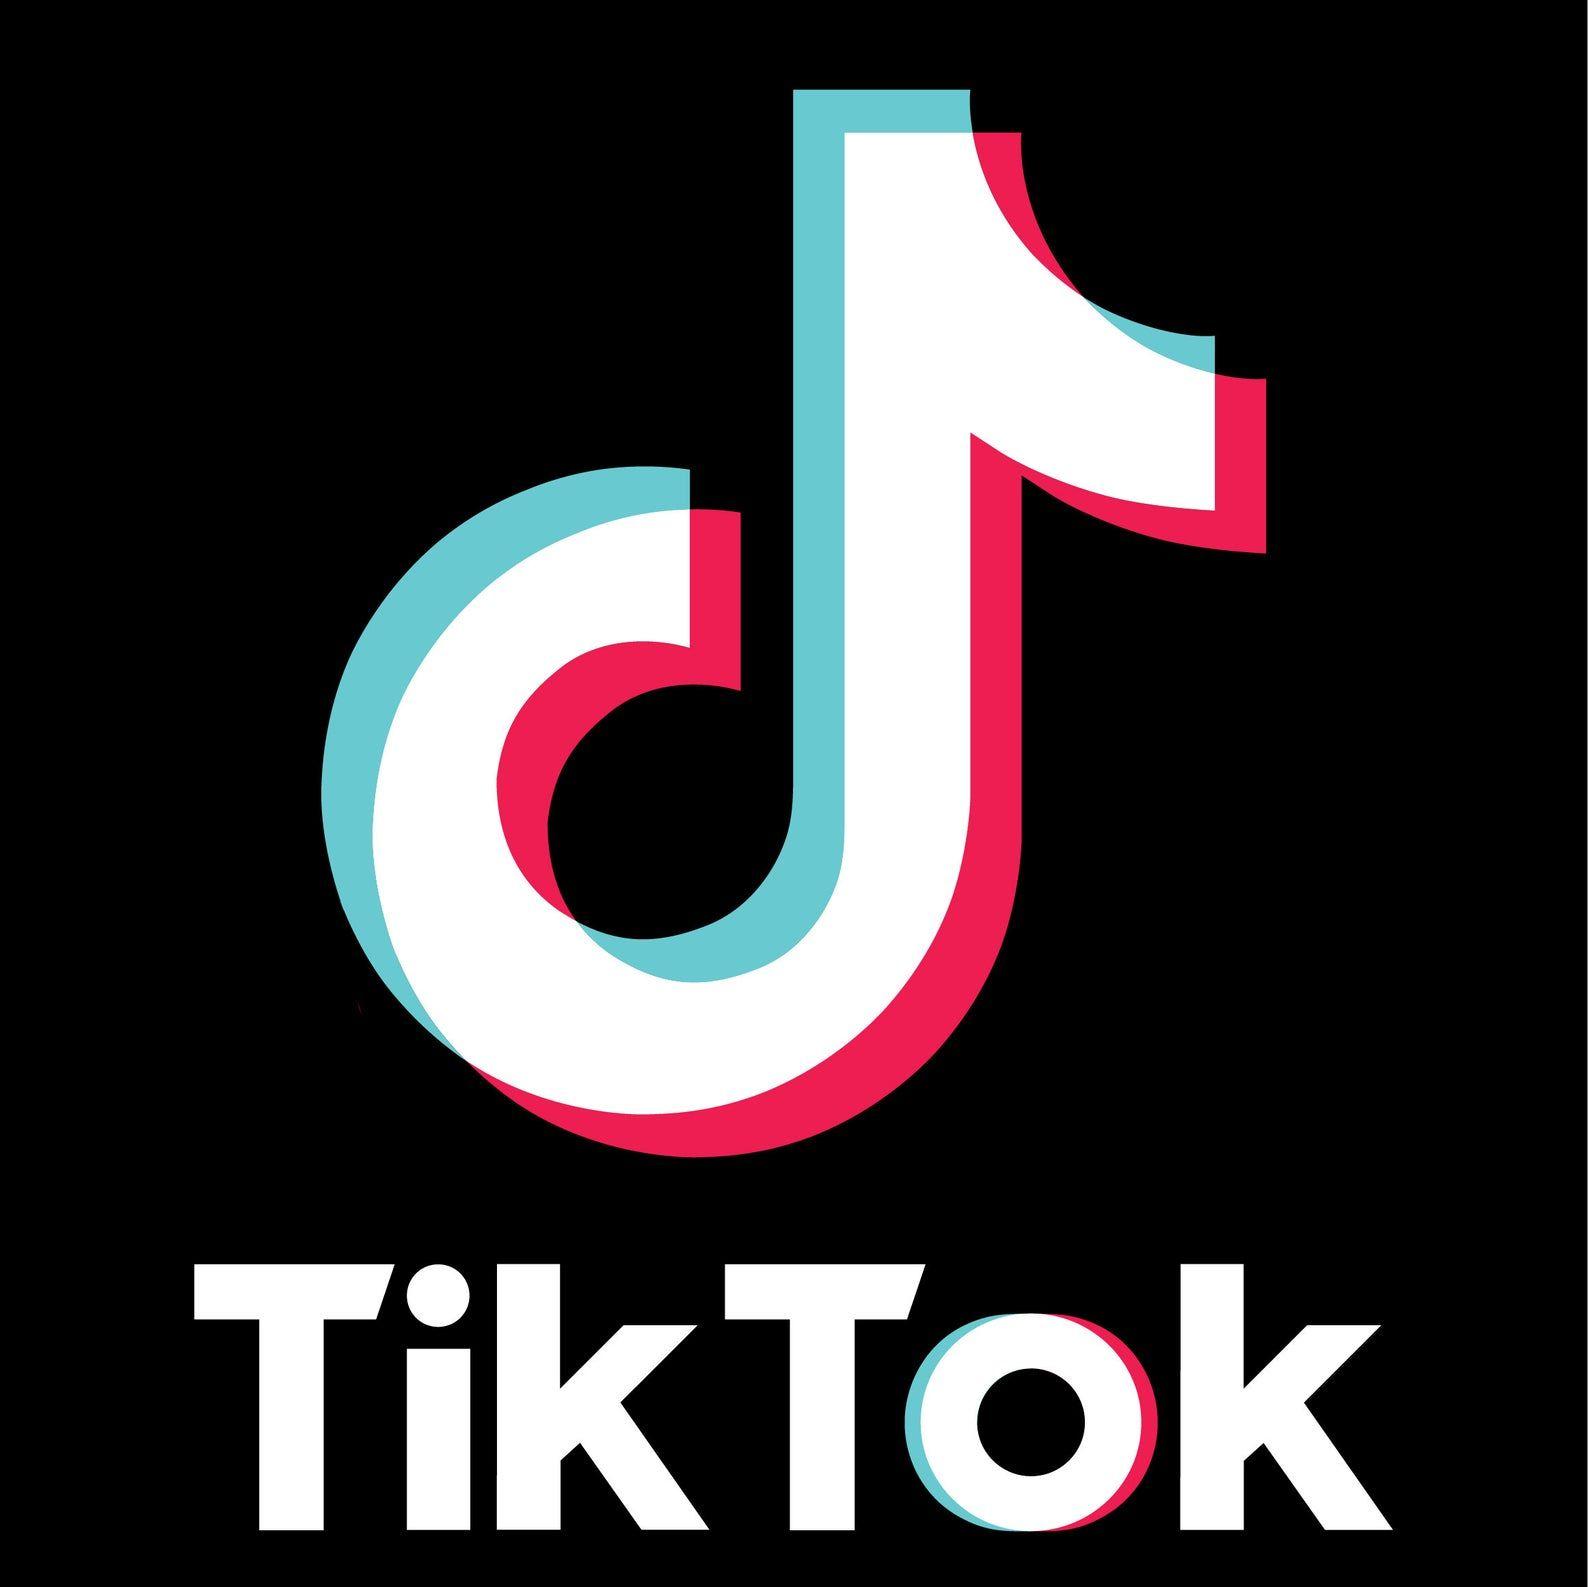 Tiktok Logo Sticker Vinyl Decal Adesivos De Carro Engracados Adesivos Sticker Foto Papel De Parede